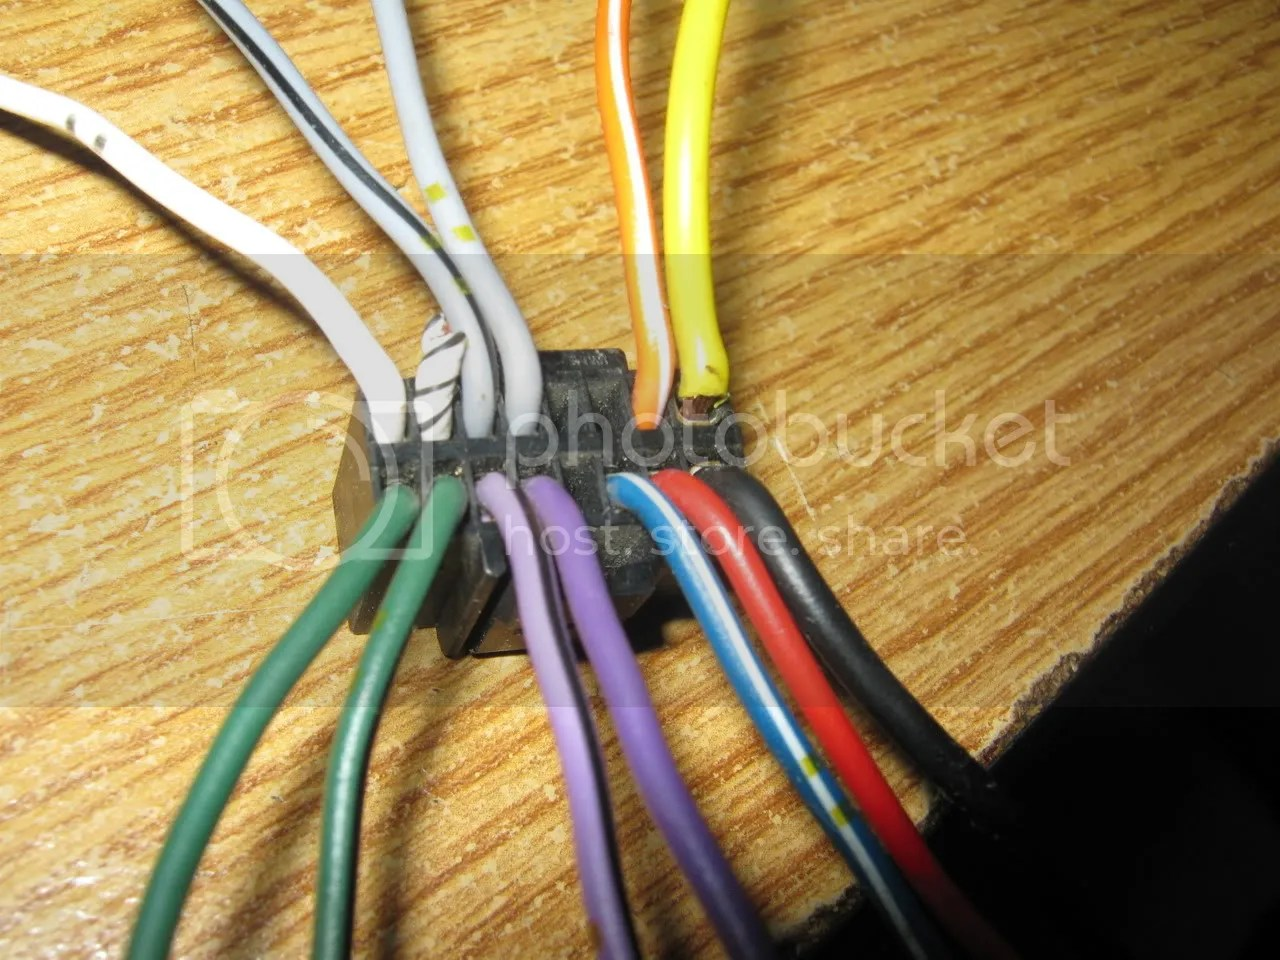 hight resolution of avh p5700dvd wiring schema diagram database pioneer avh p5700dvd wiring harness colors